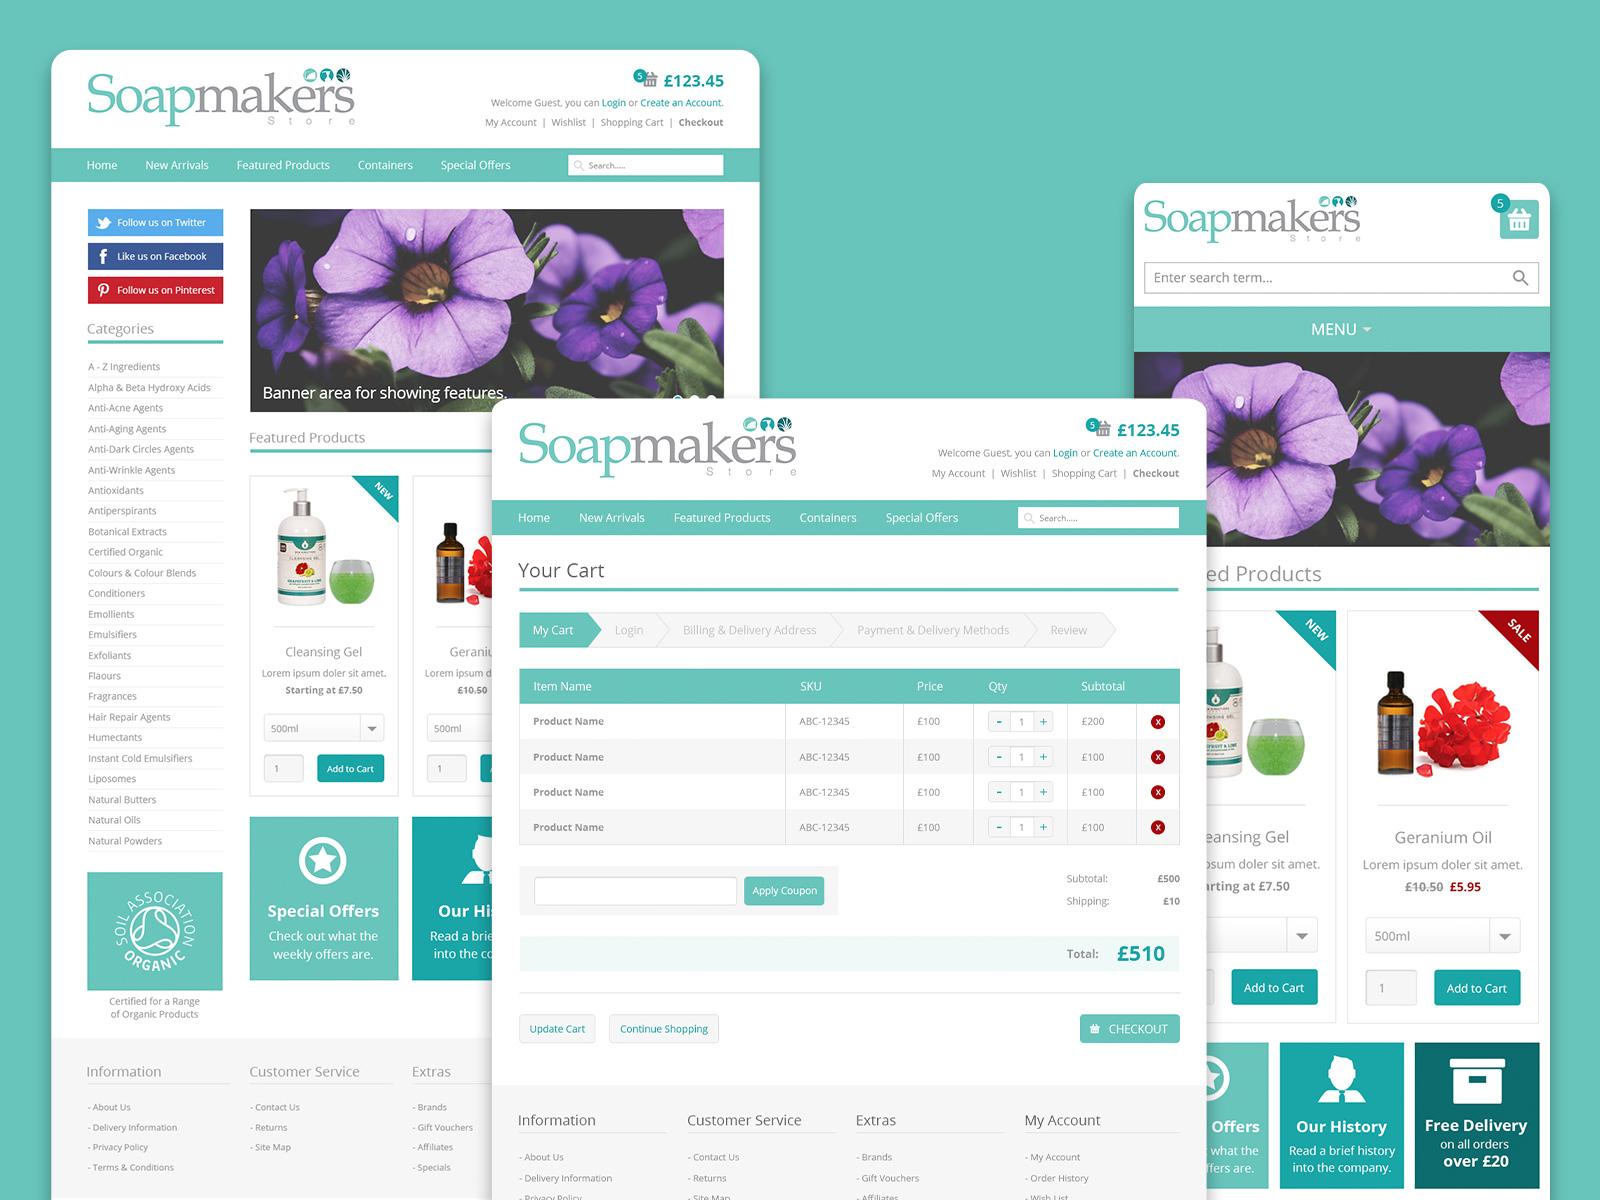 Soapmakers Store eCommerce website design created by freelance website designer Christine Wilde